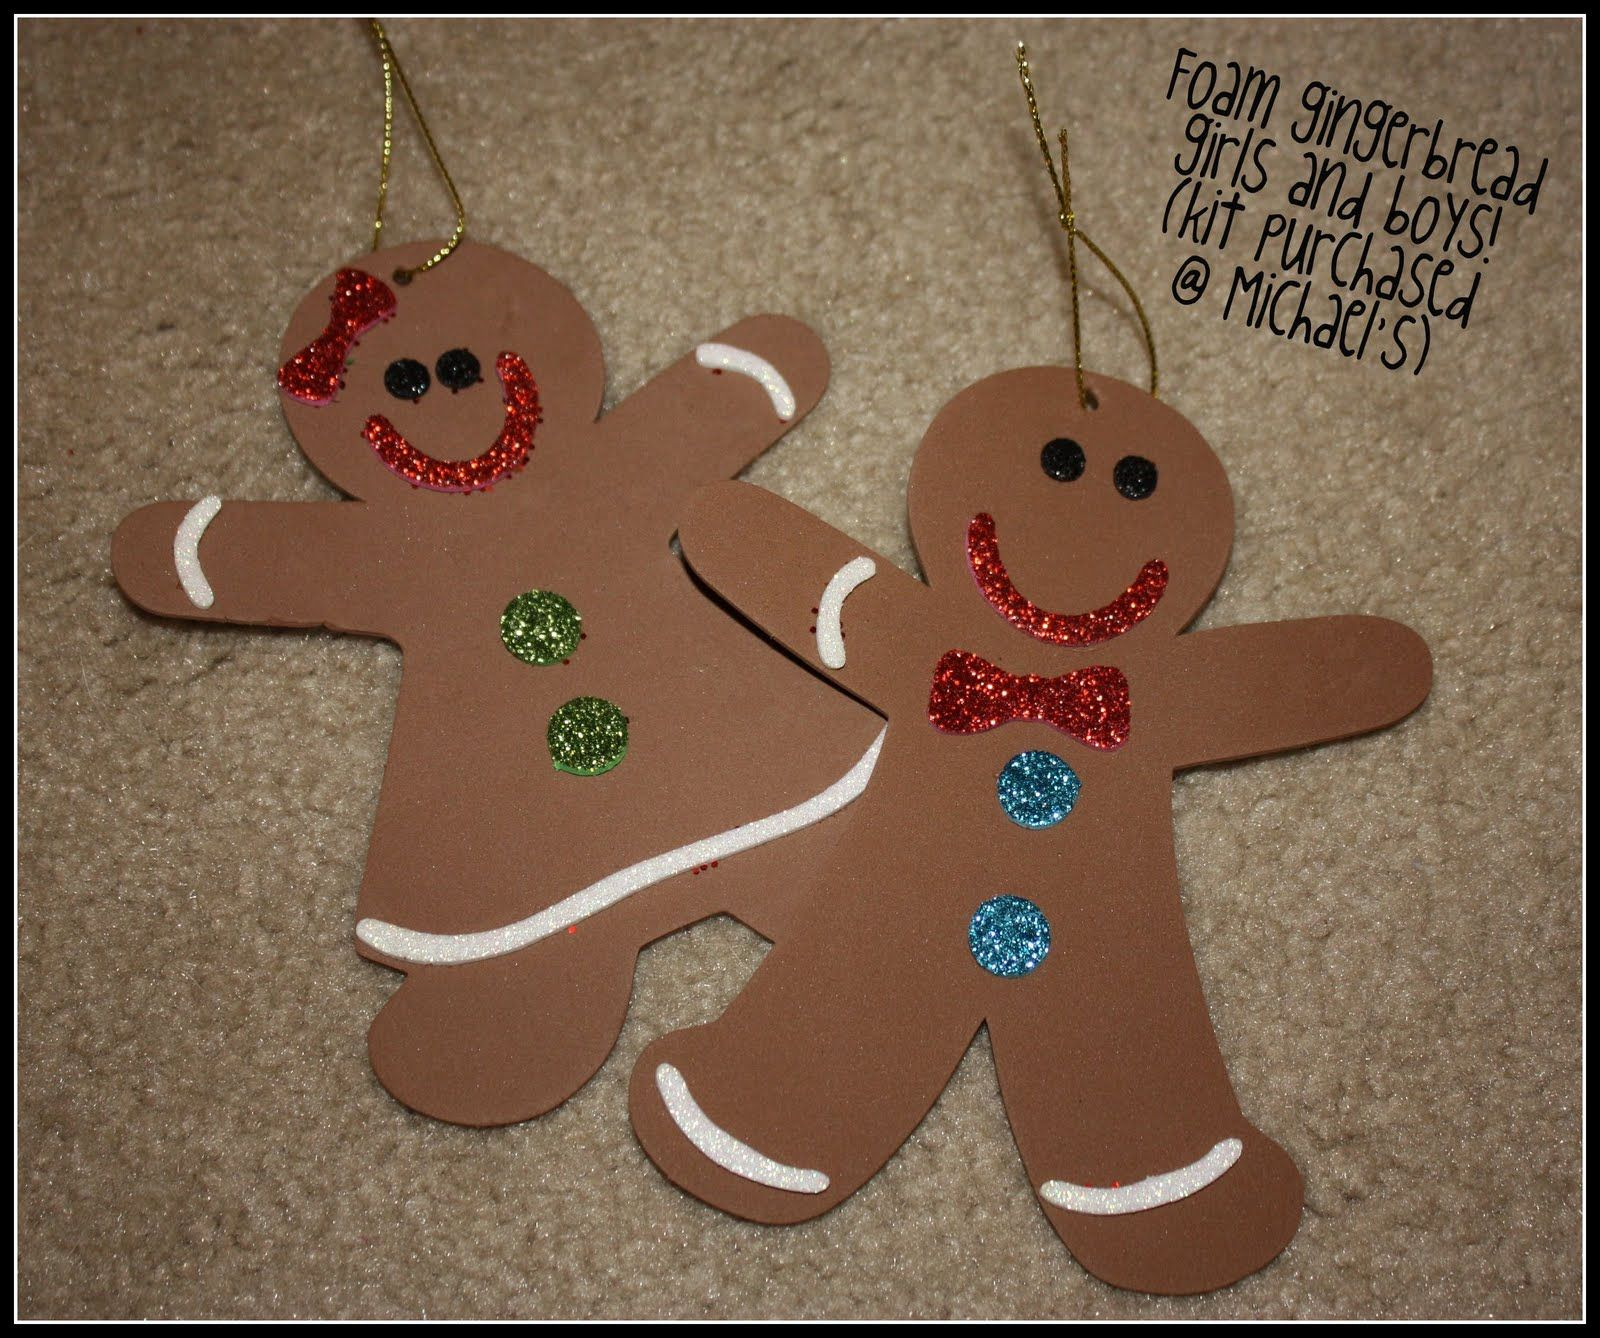 foam gingerbread ornaments Michaels kit  Classroom Ideas